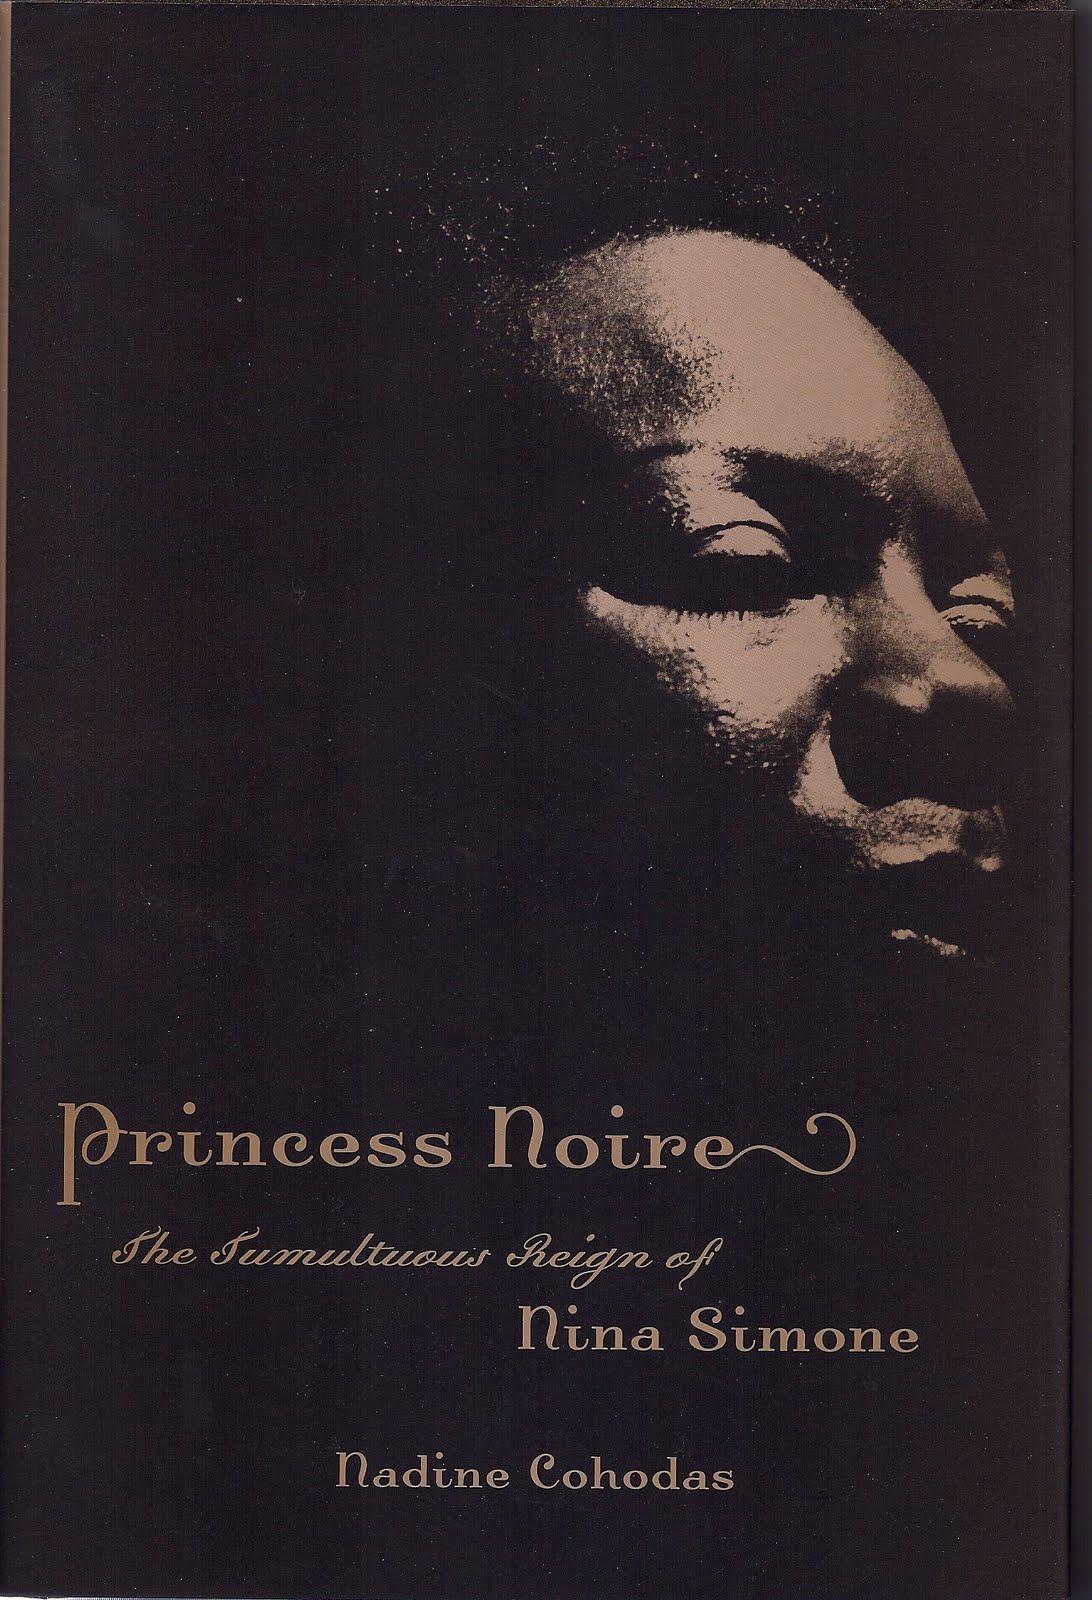 Nadine Cohodas Nina Simone book